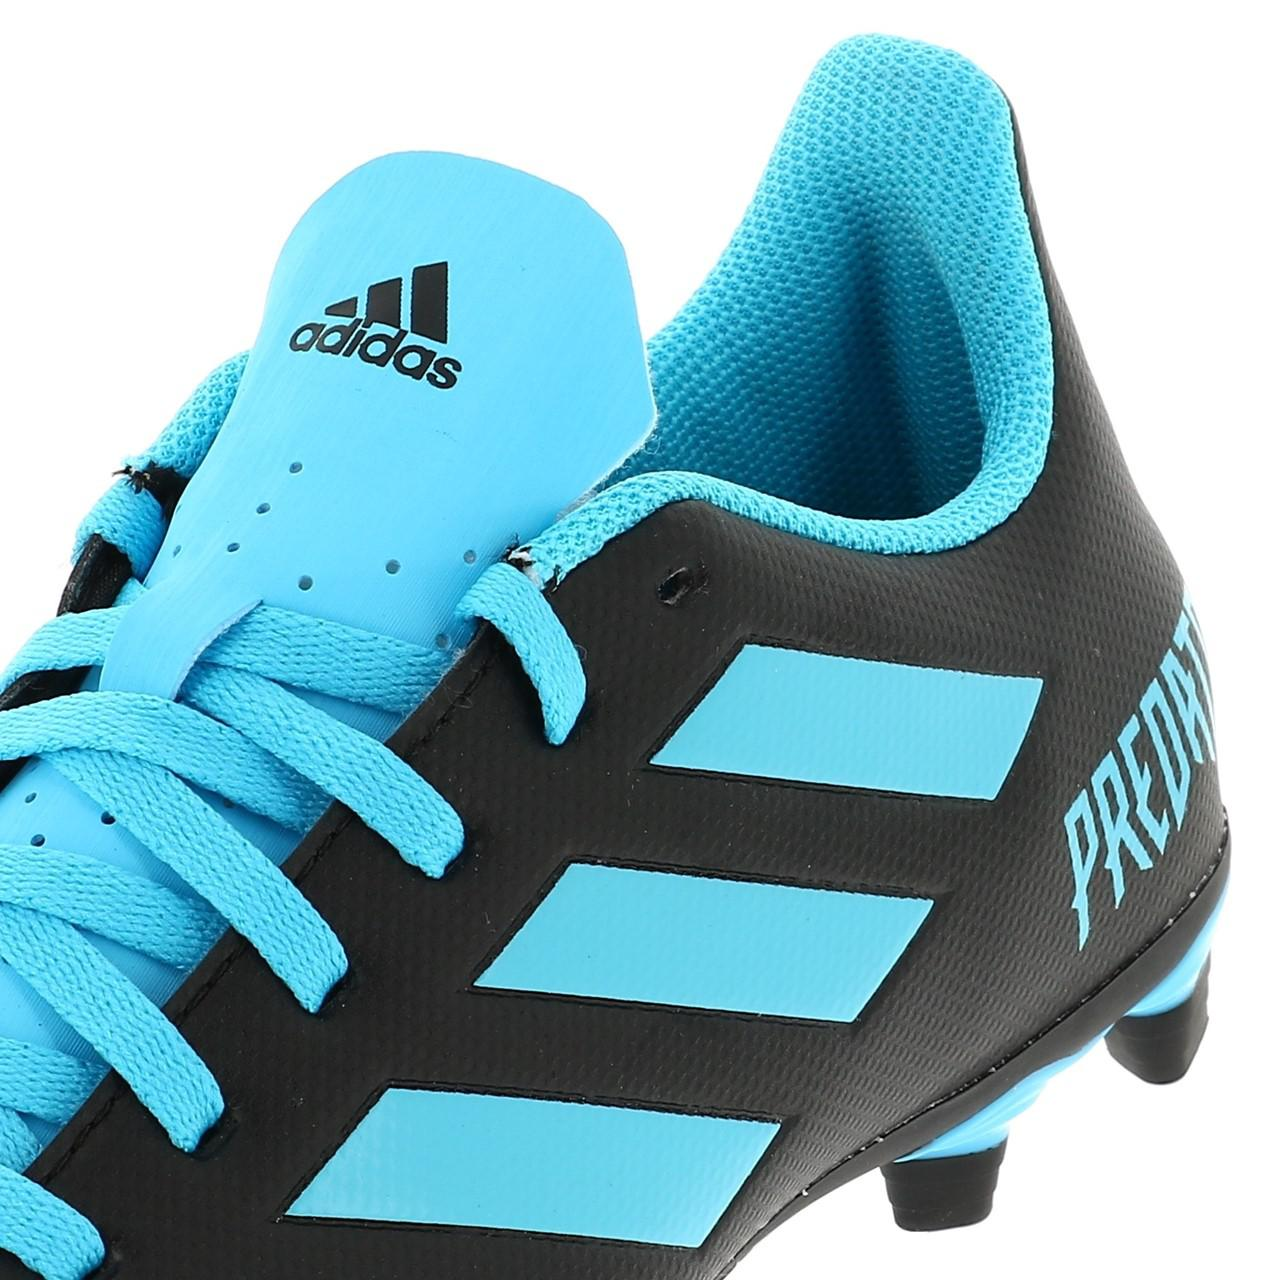 Chaussures-football-lamelles-Adidas-Predator-19-4-fg-grorg-Noir-42821-Neuf miniature 2